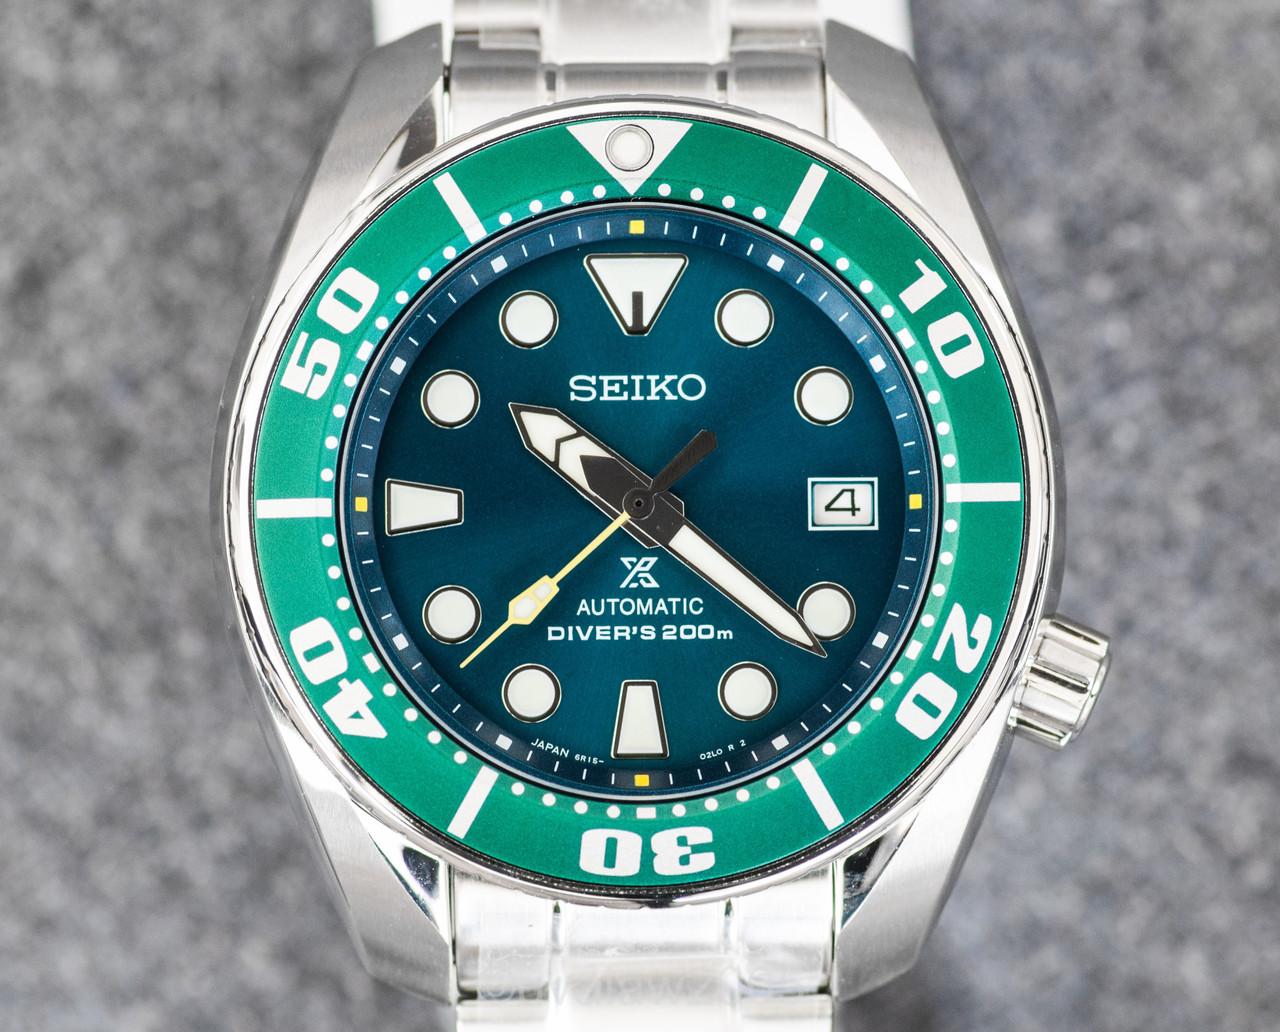 Часы Seiko Prospex SZSC004 Automatic Diver's 6R15 Green Sumo